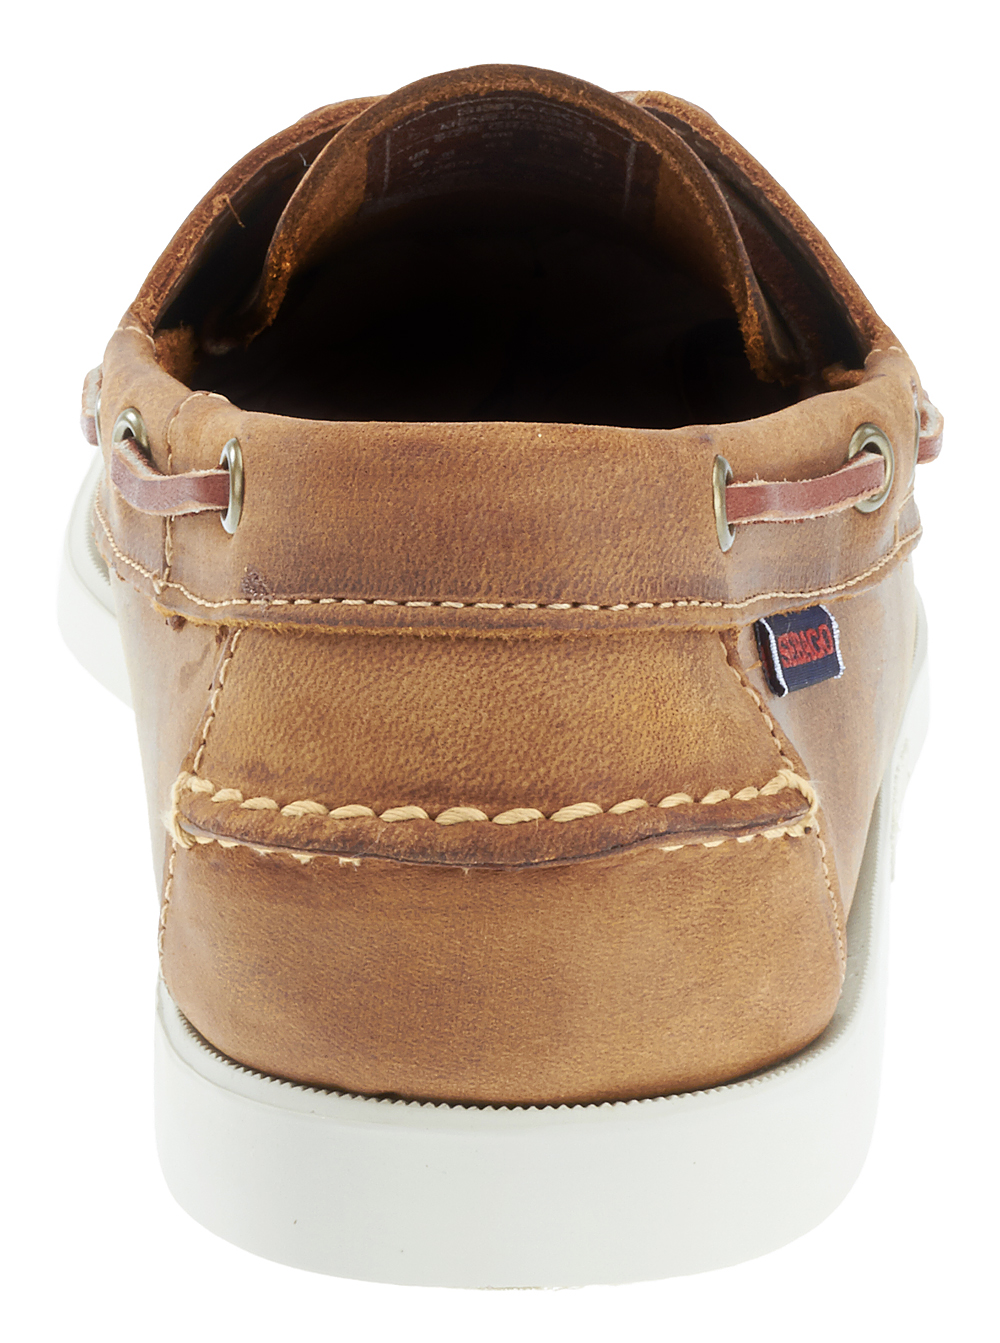 Sebago Mens Docksides Leather Boat Shoes in Brown